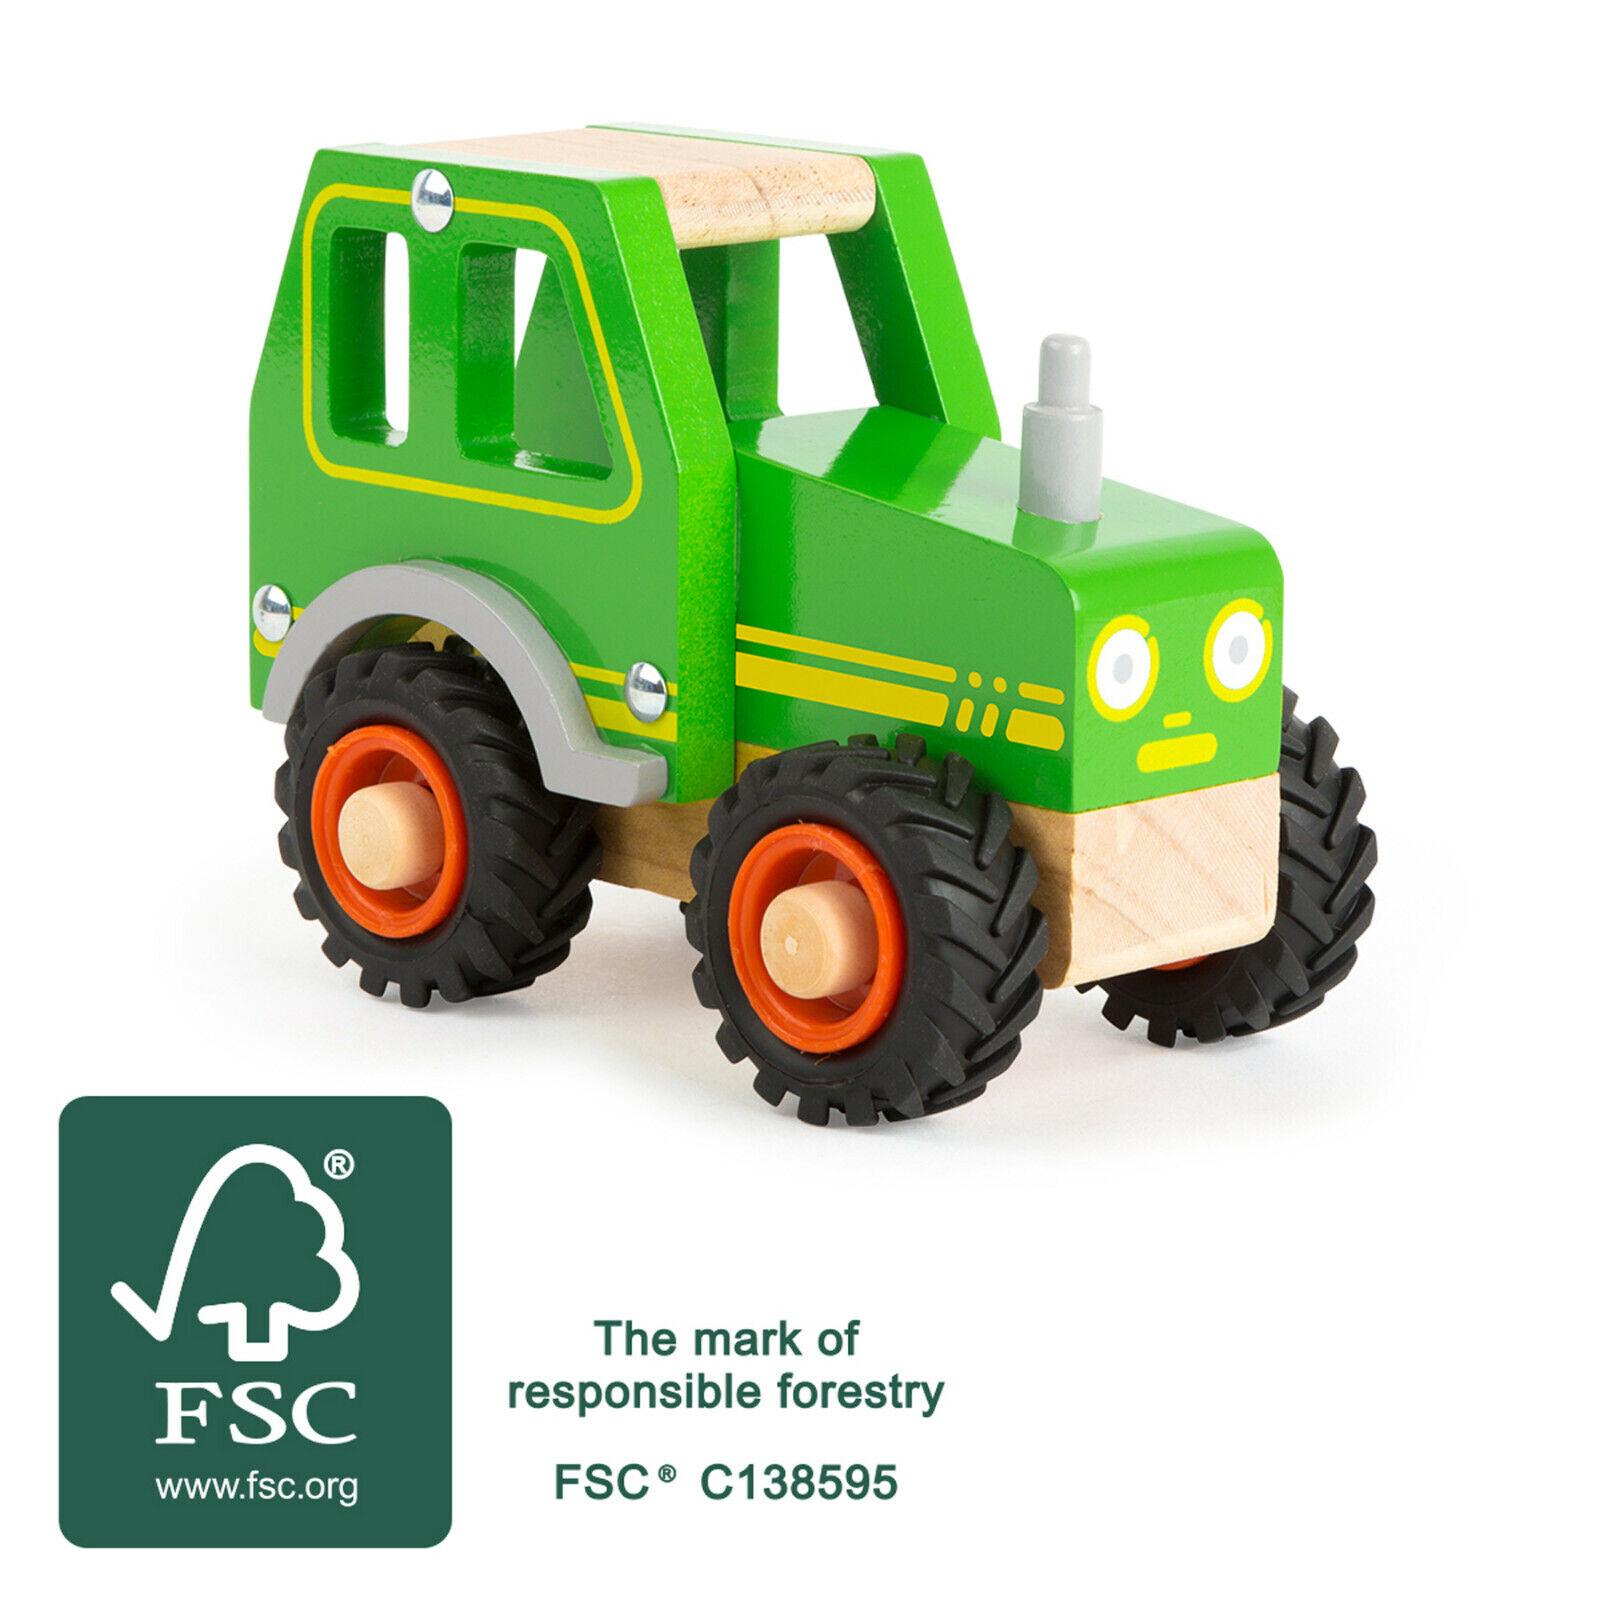 small foot  Kindertraktor aus Holz, Holztraktor, Trecker,Holzspielzeug